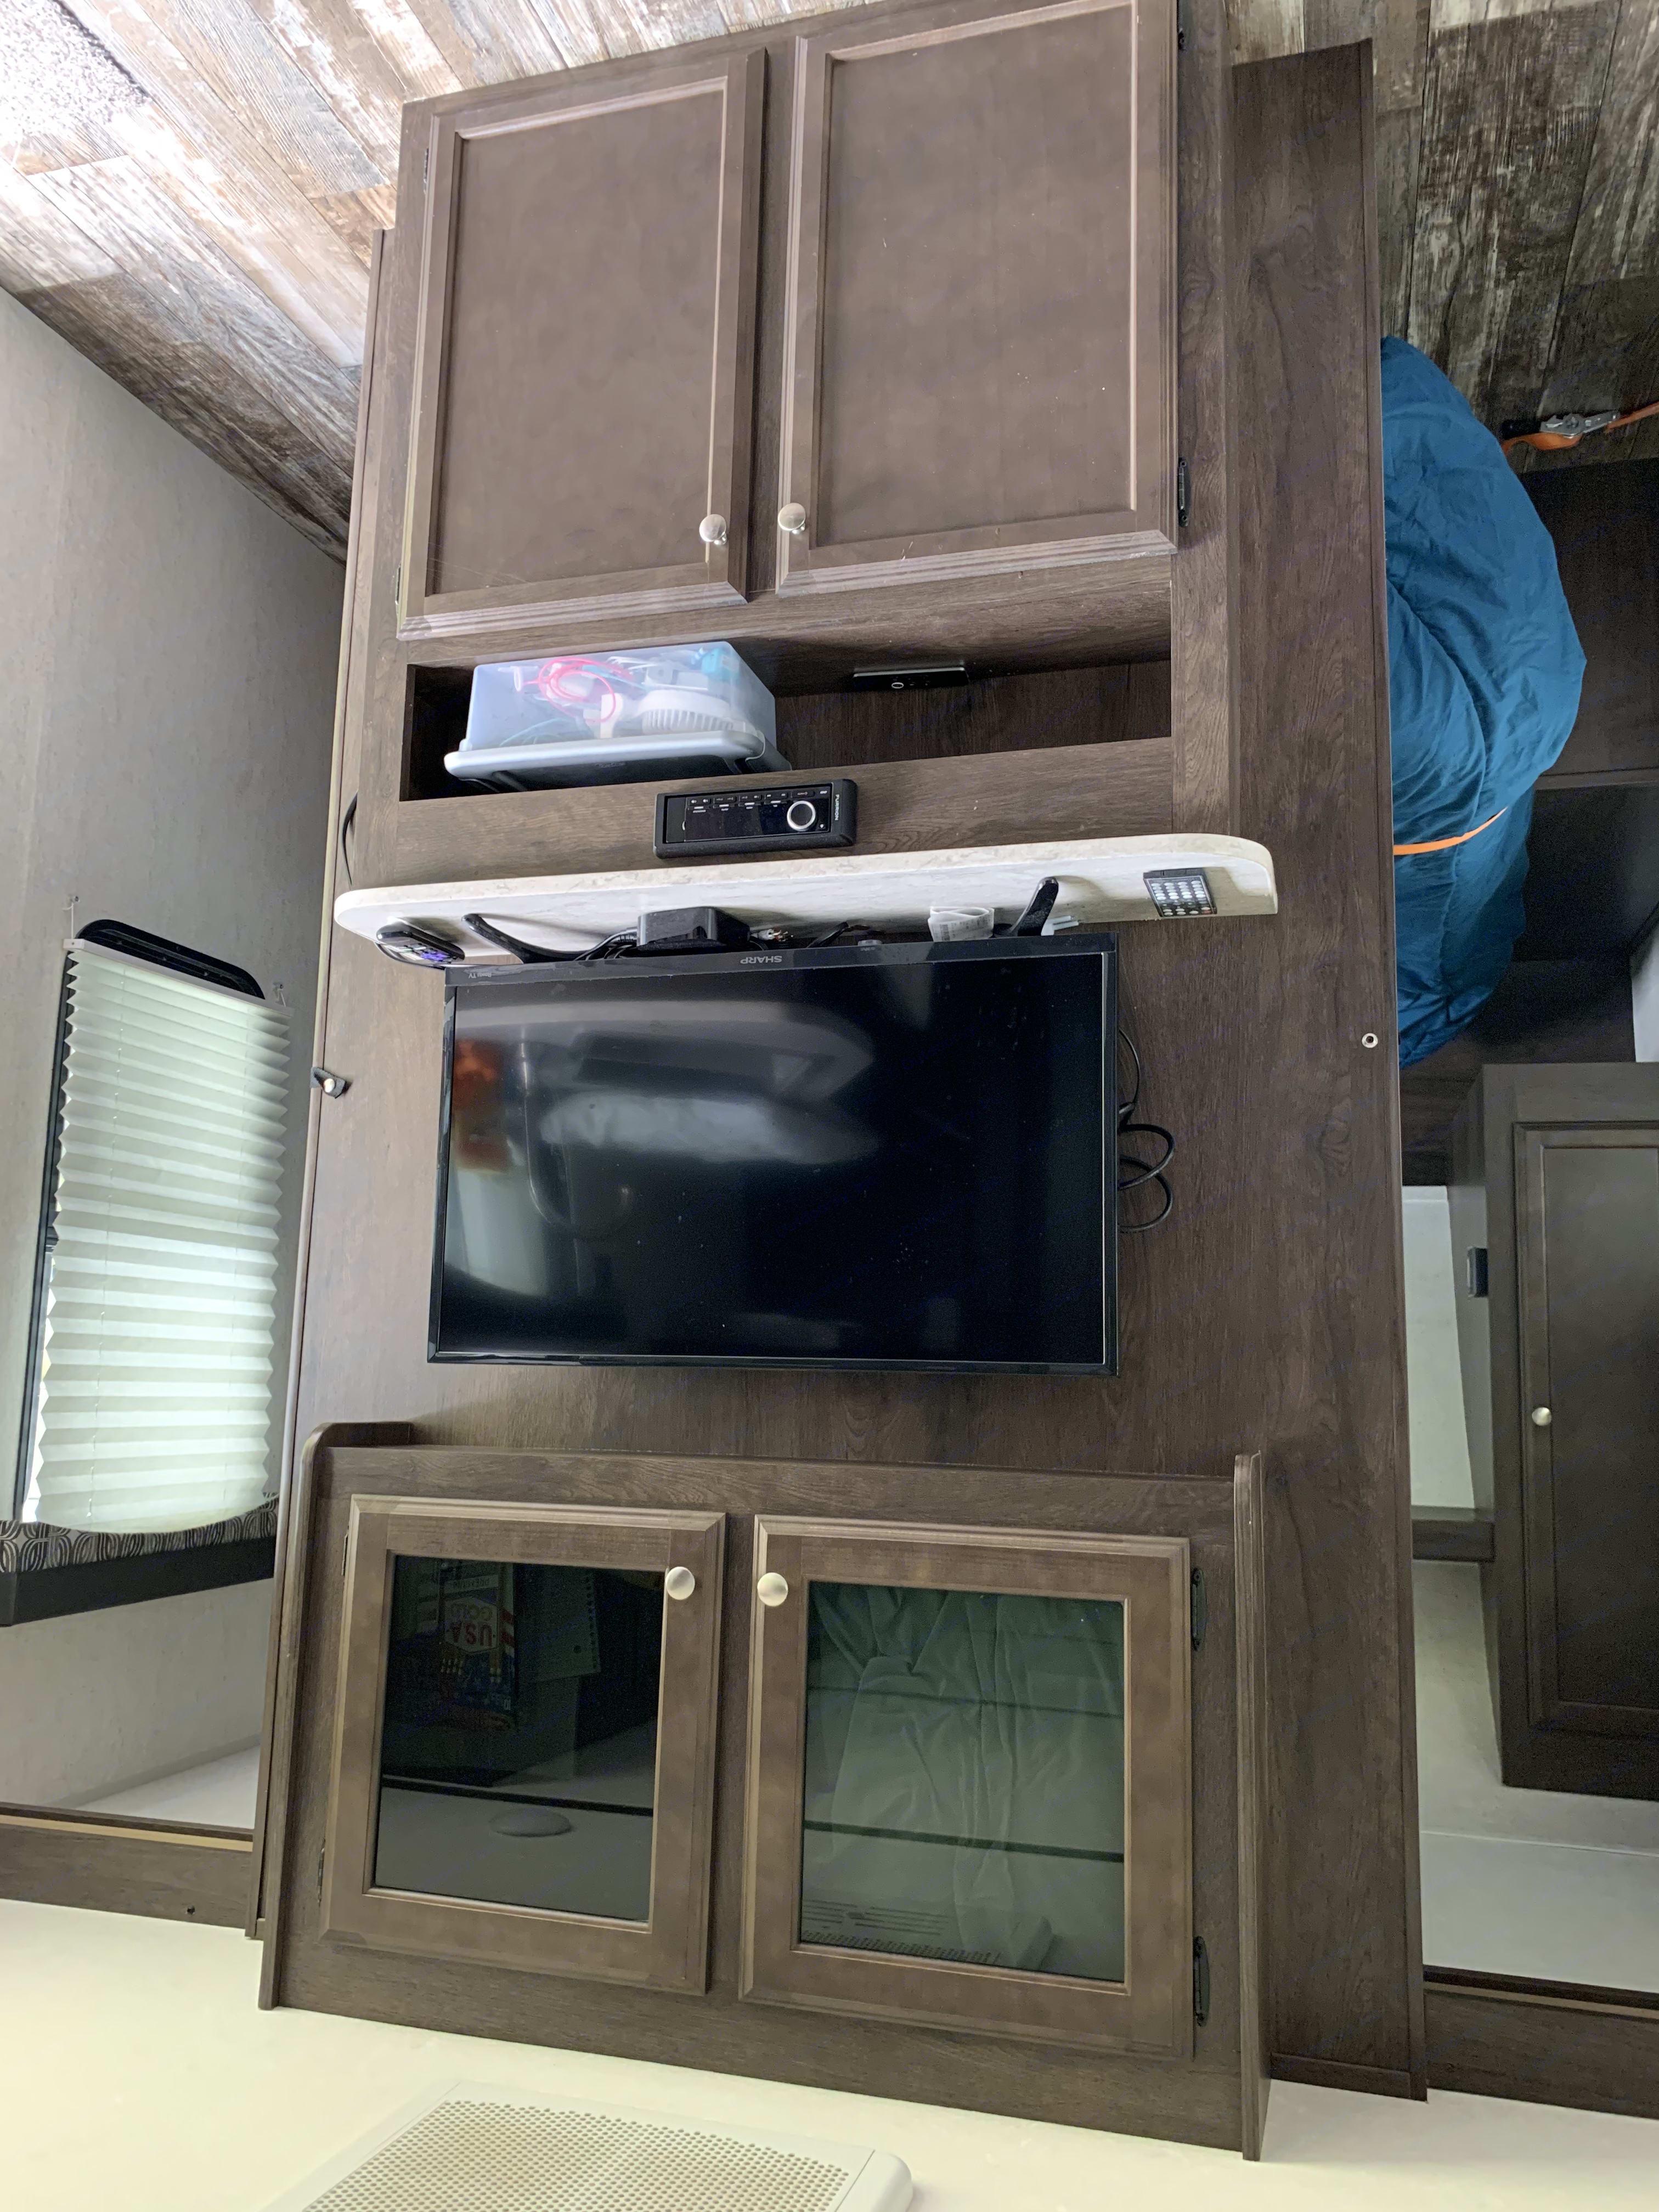 TV - sorry it's upside down. Starcraft Autumn Ridge 2018